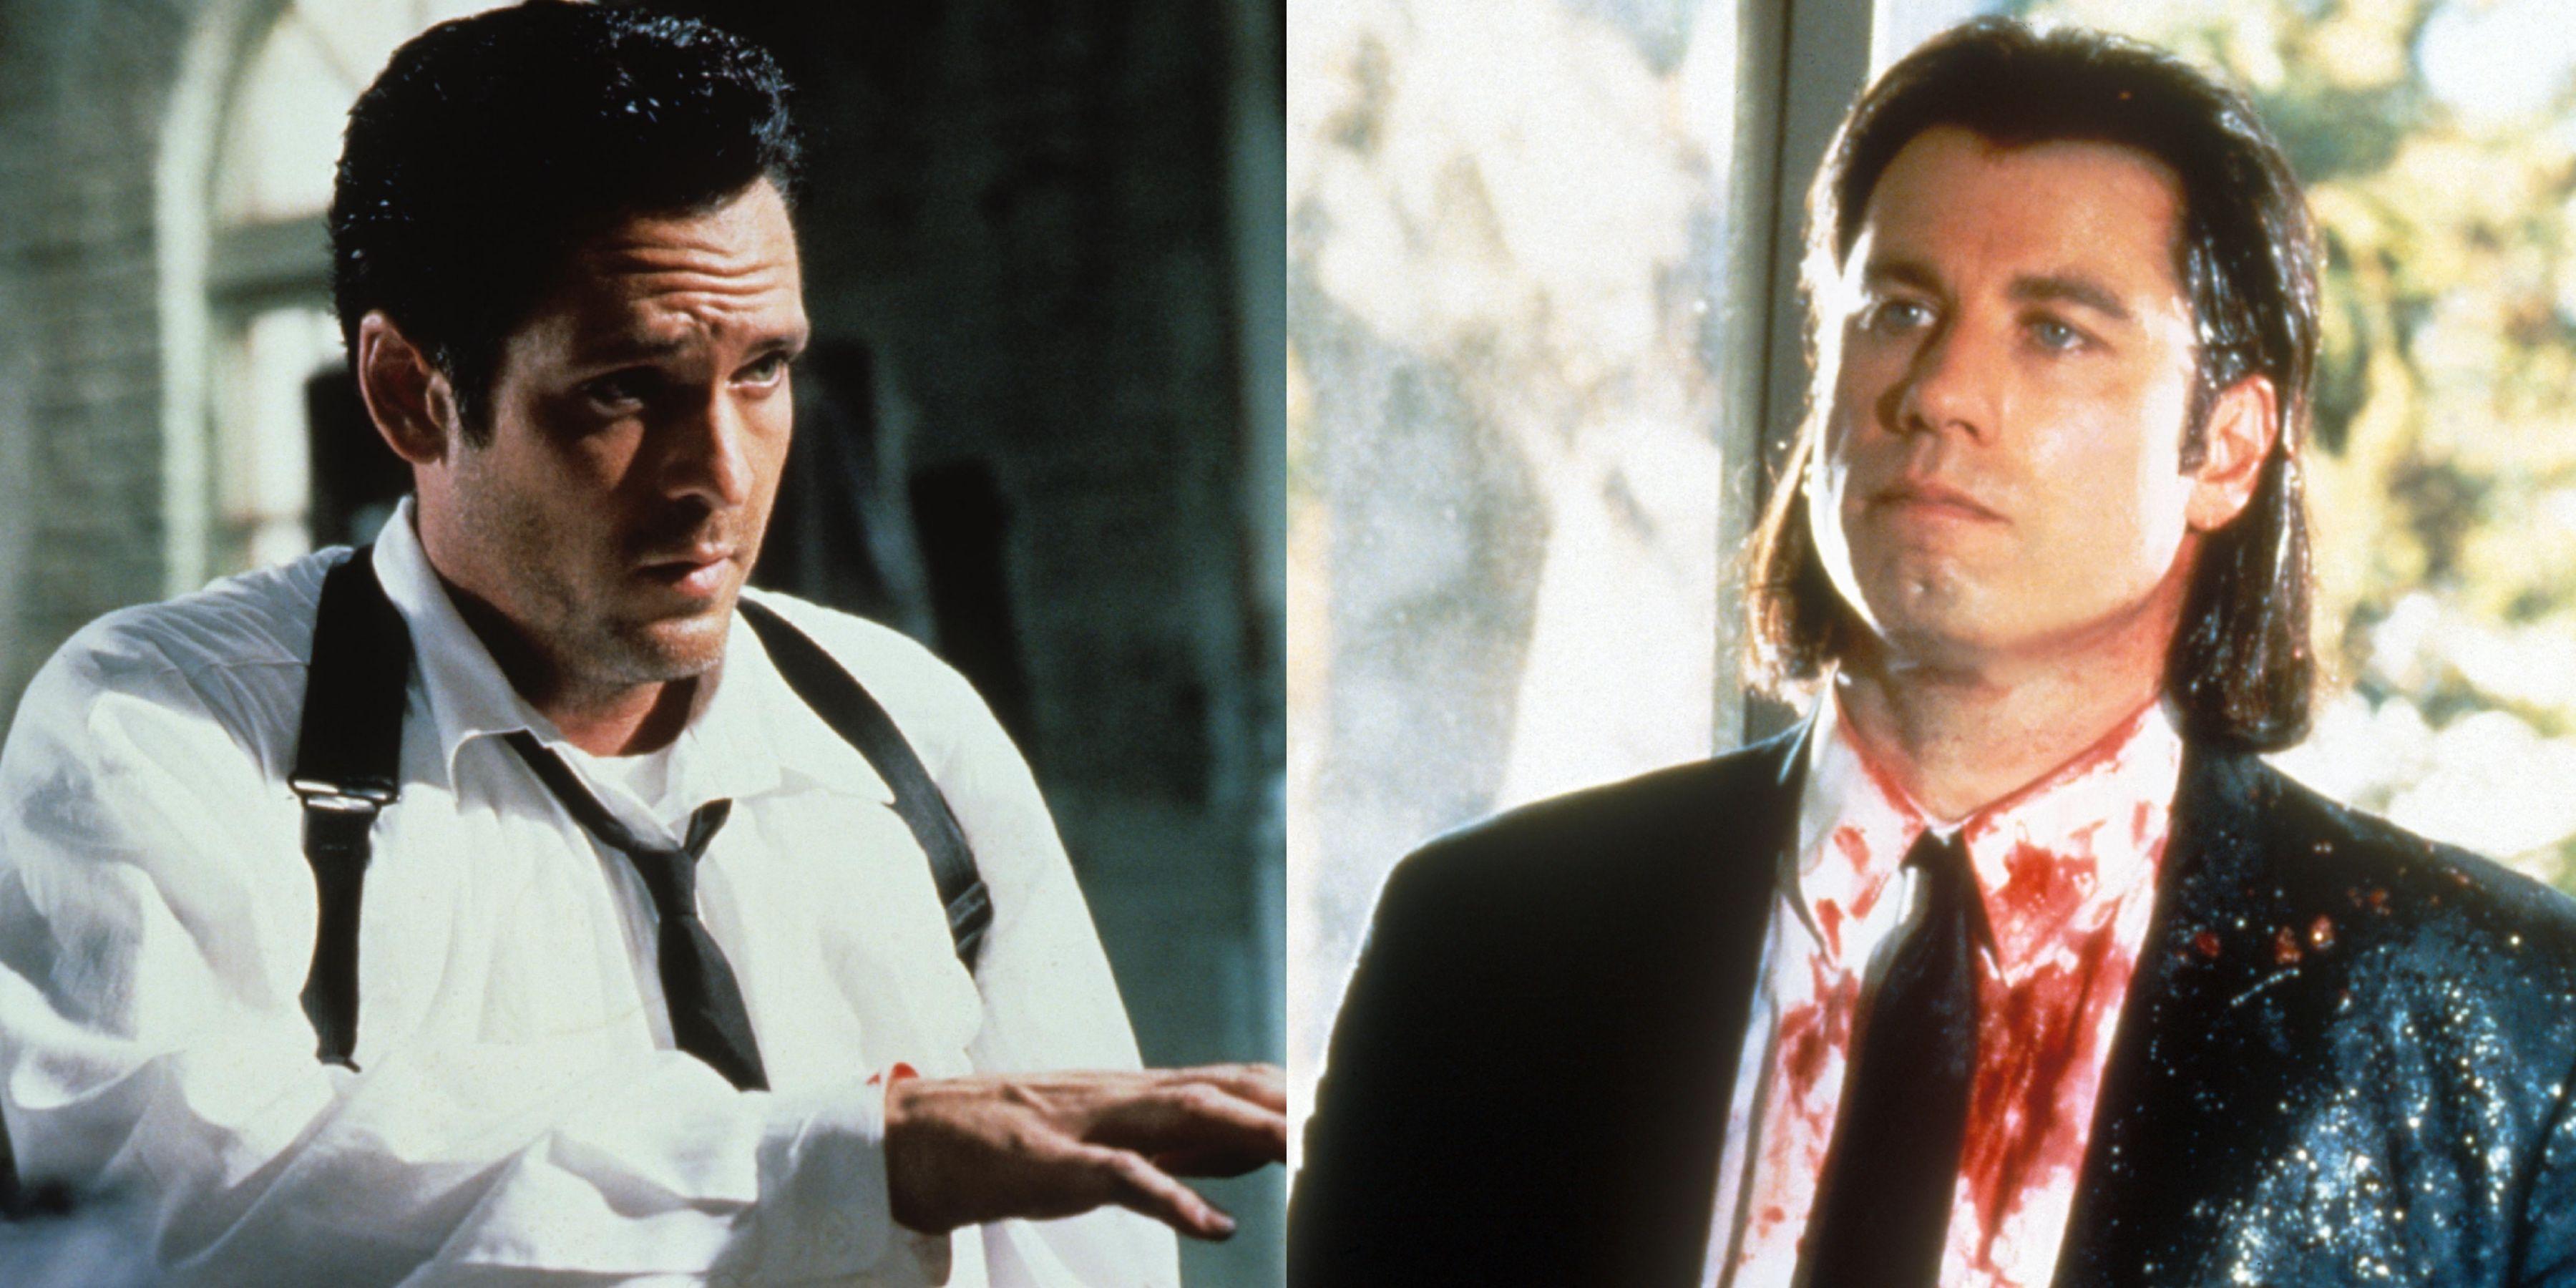 Quentin Tarantino Pulp Fiction Prequel Plot The Director